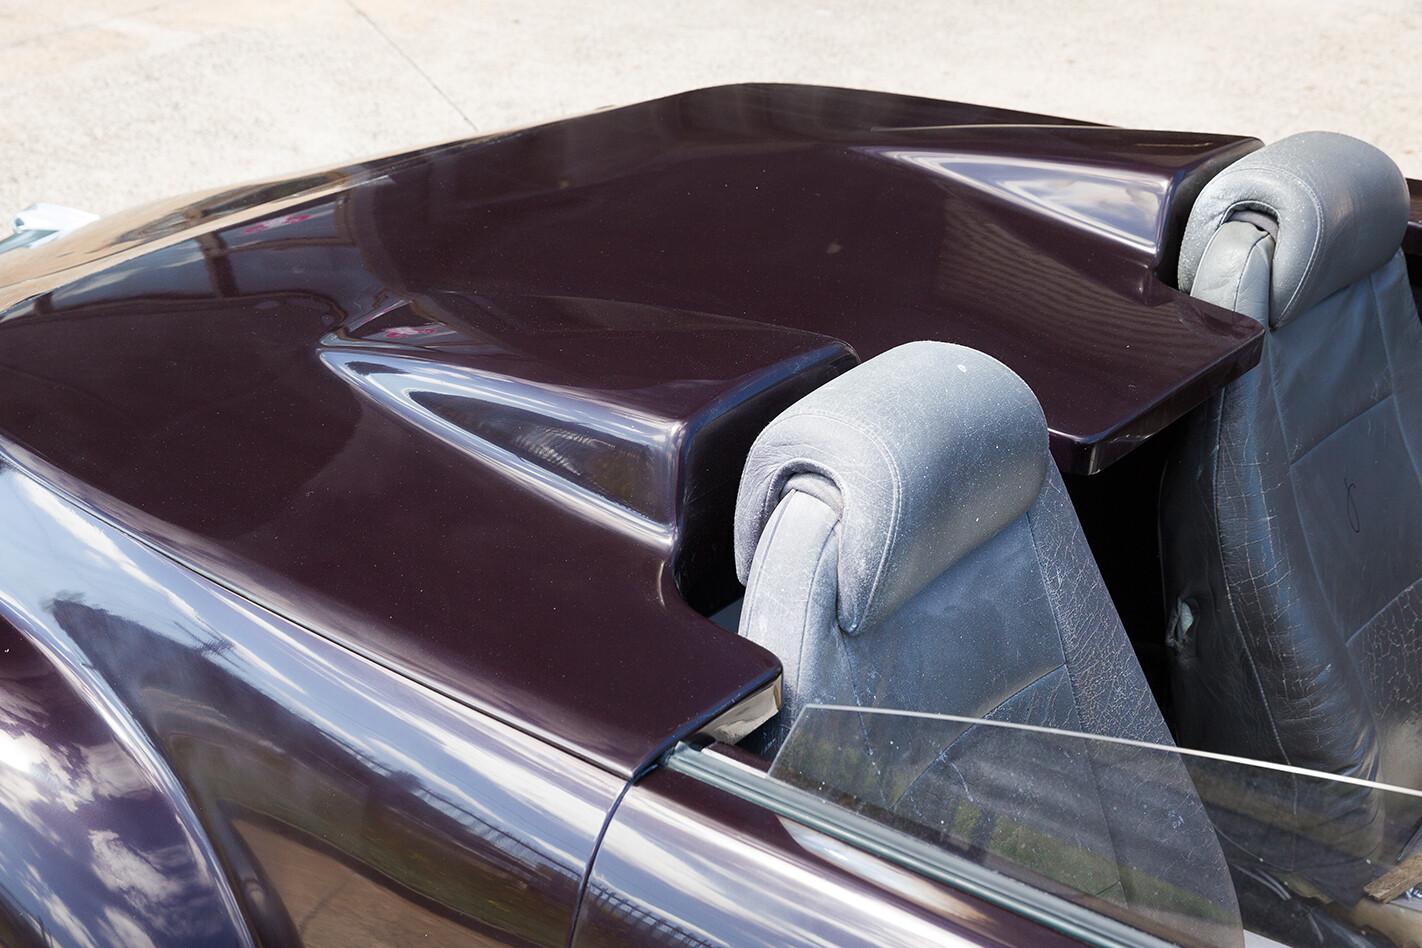 EFIJY FX rear panel